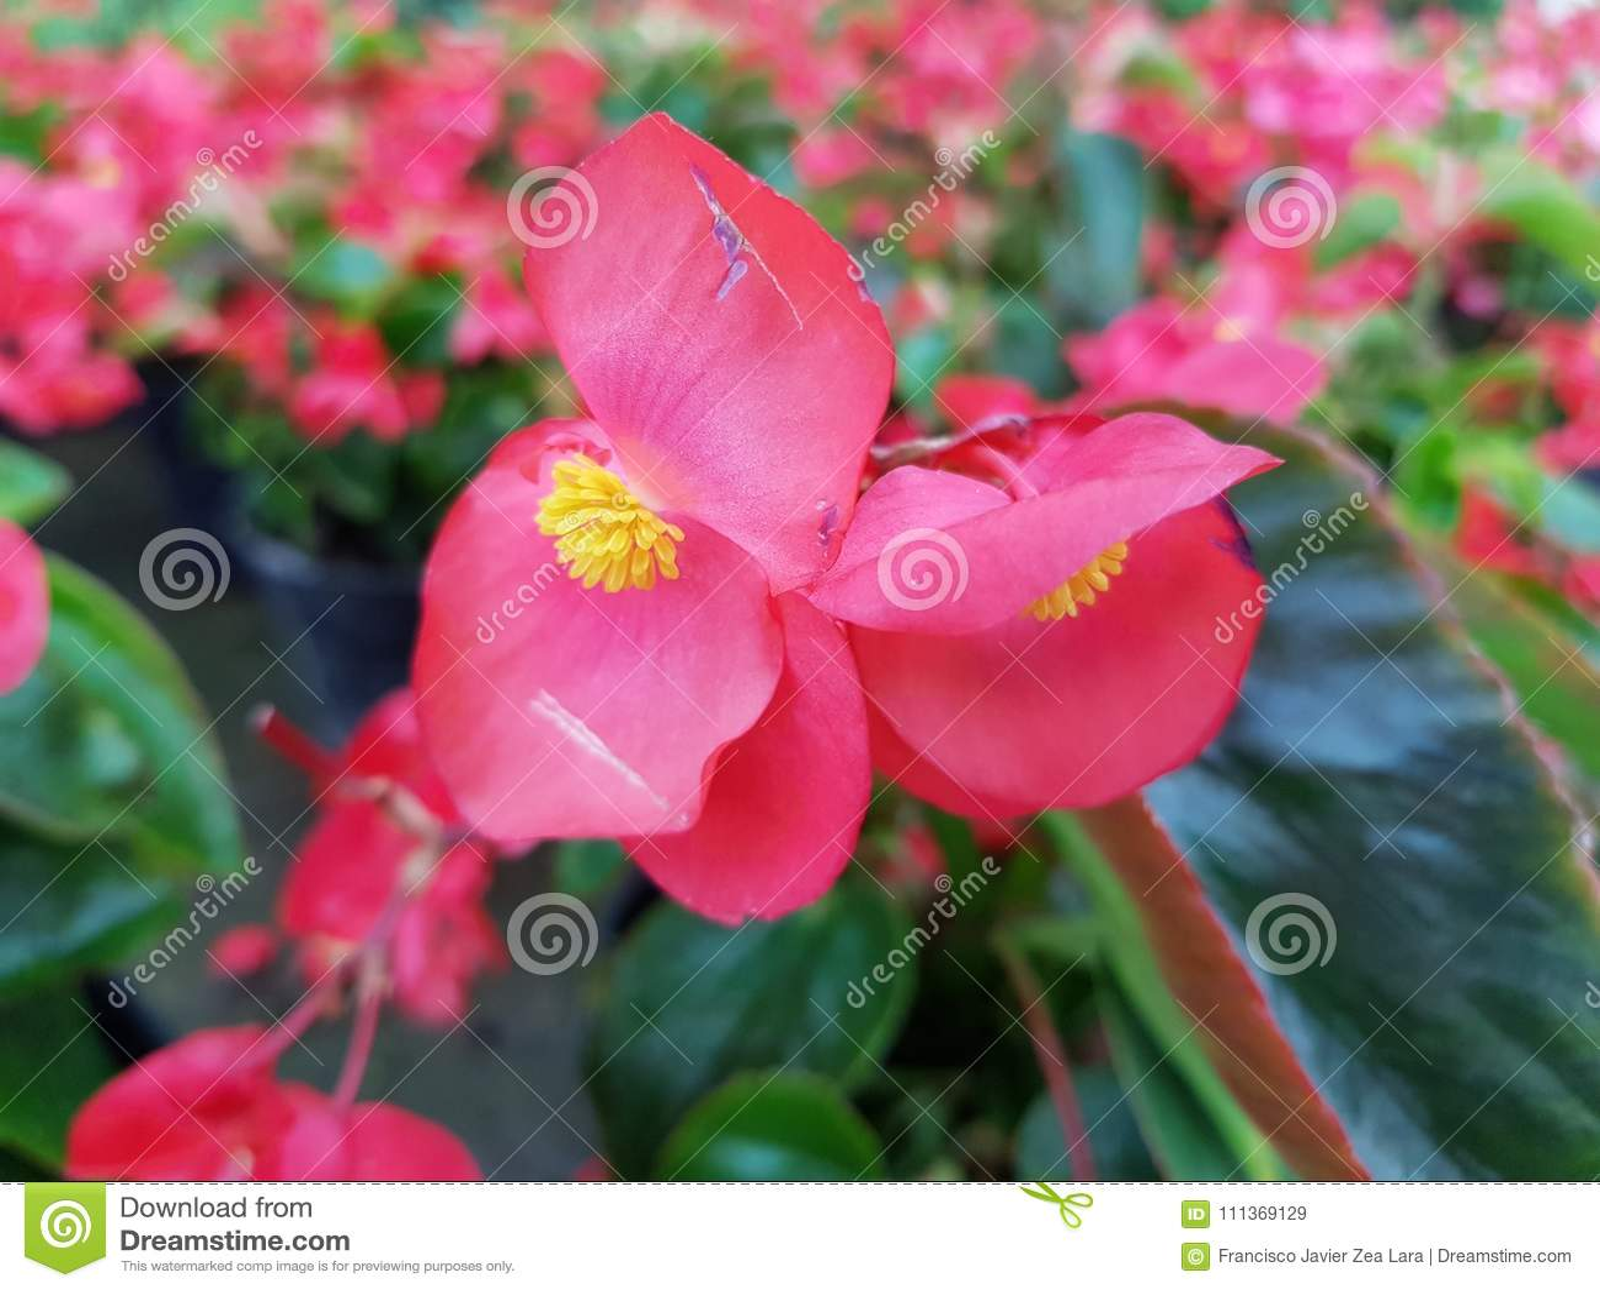 Red Begonia Dragon Flower In Garden Stock Image Image Of Flower